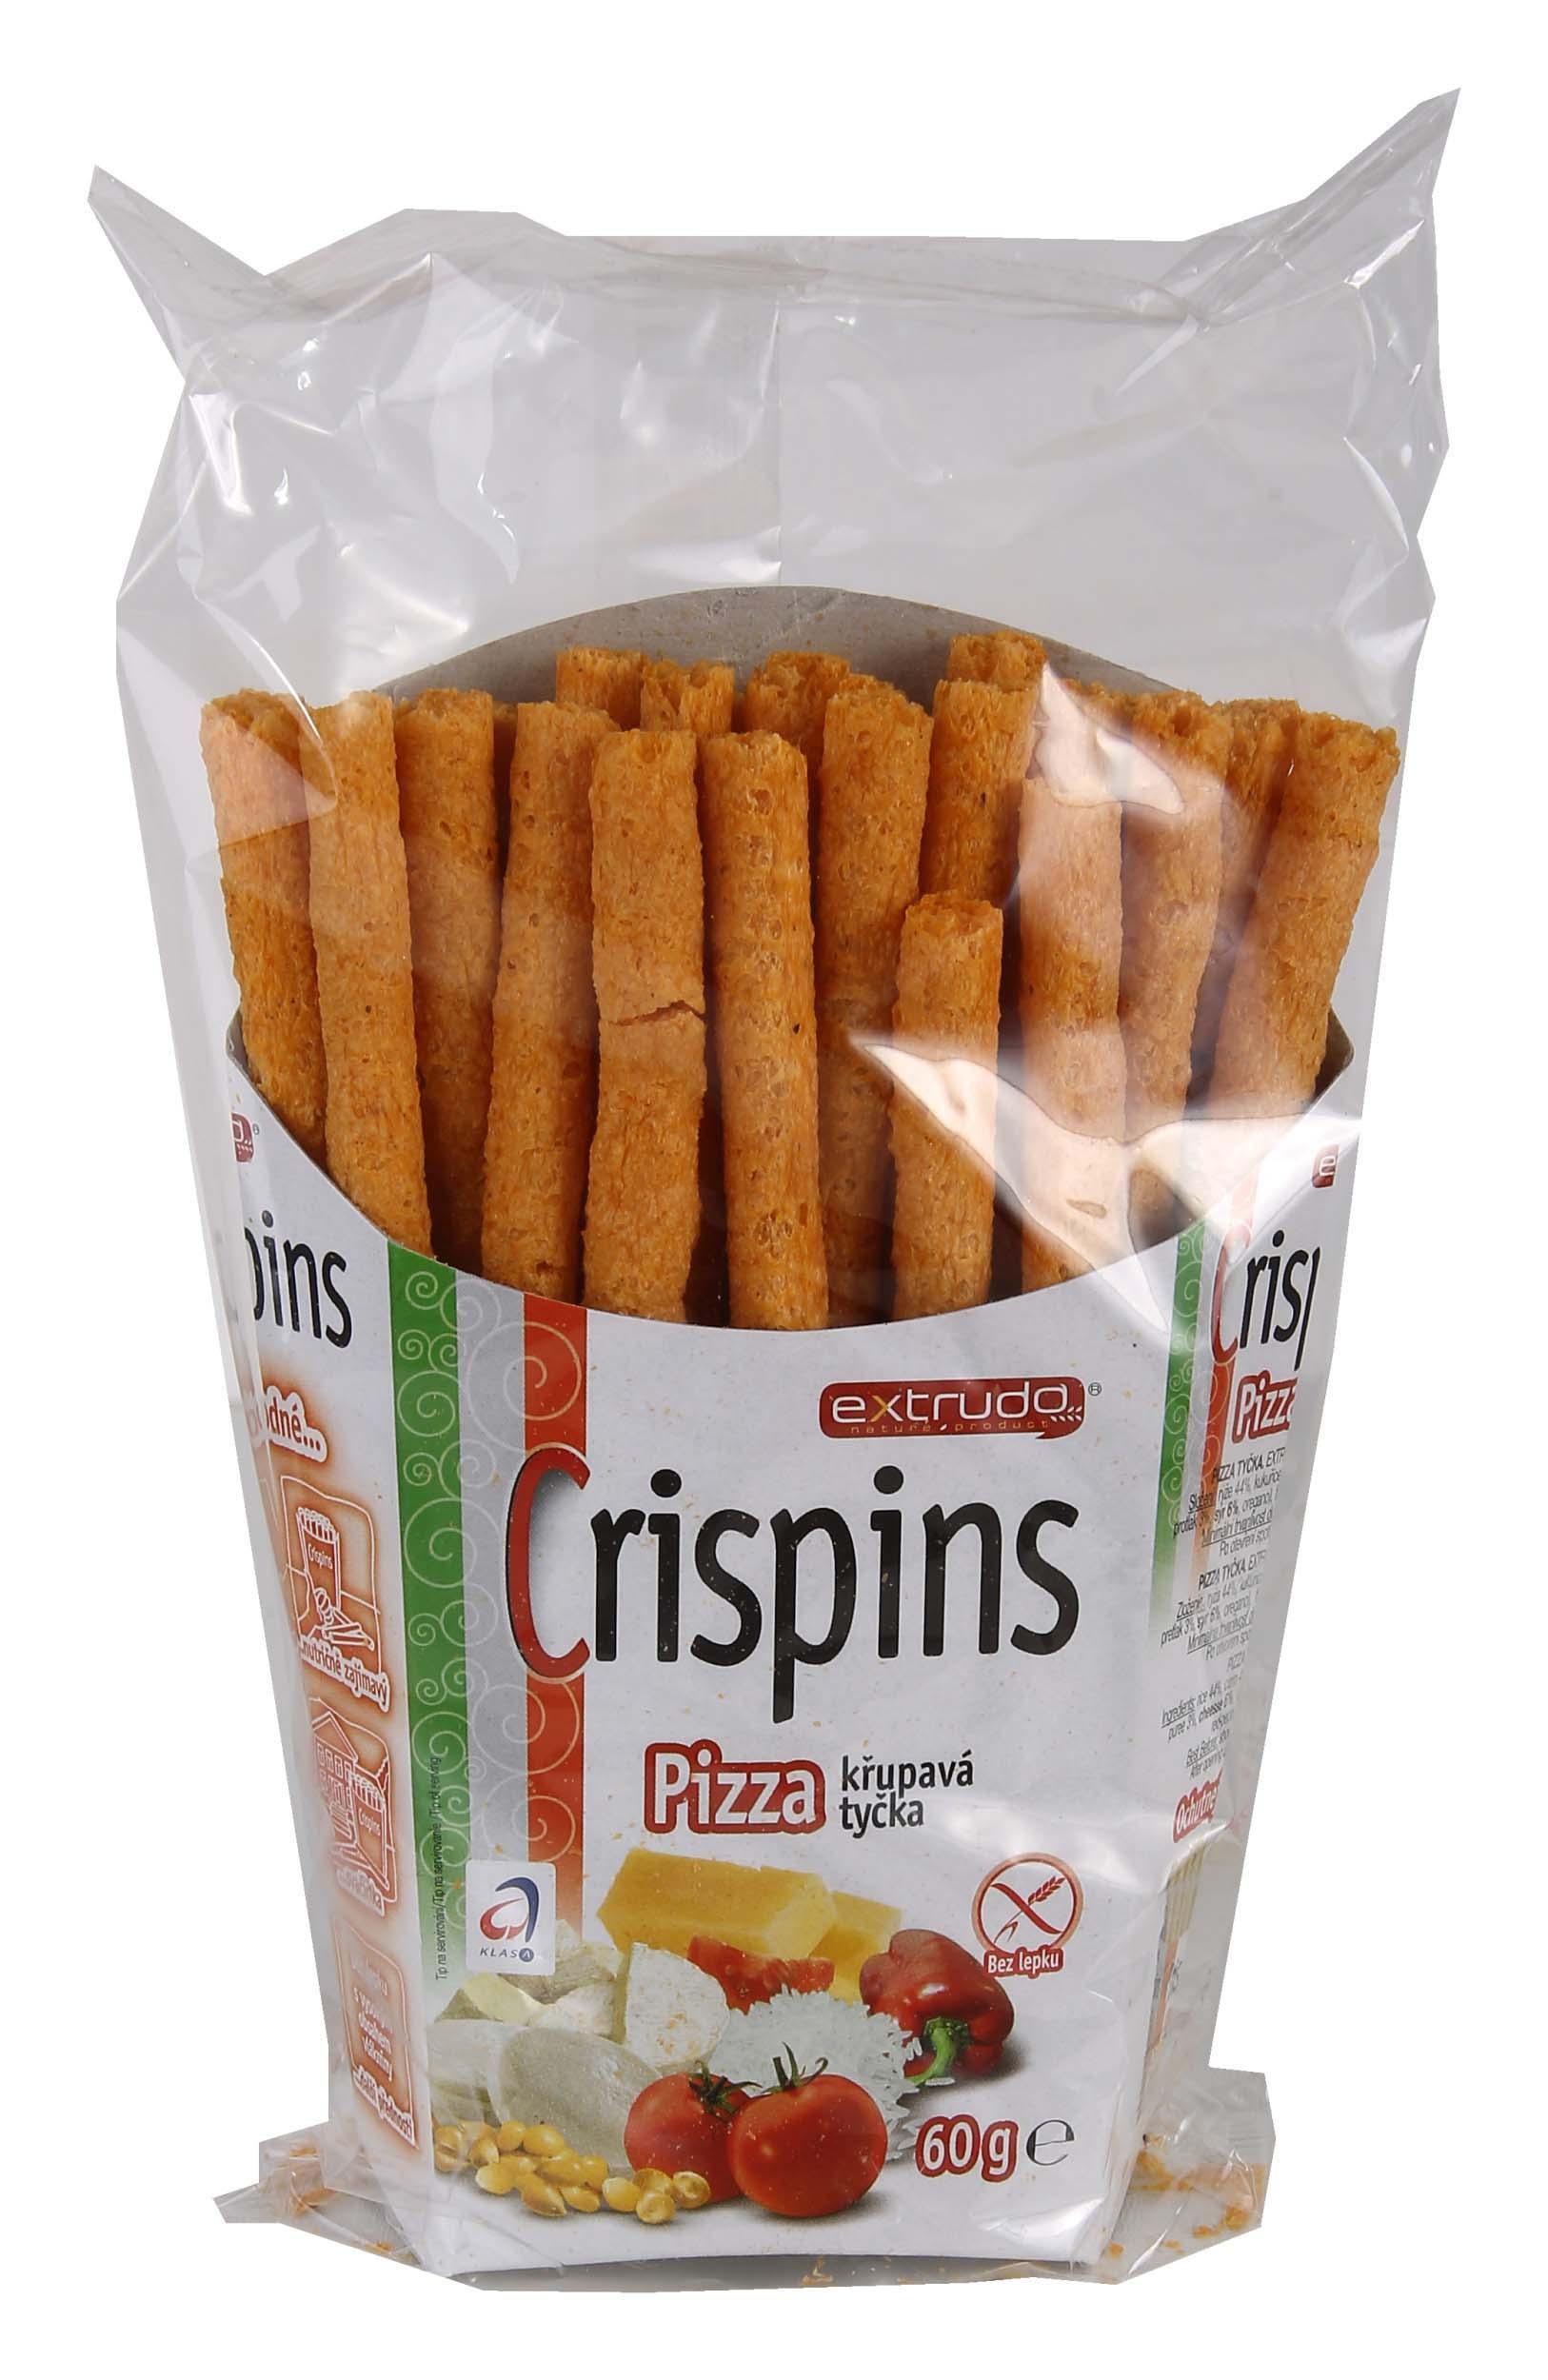 Crispins tyčka pizza 60g bez lepku